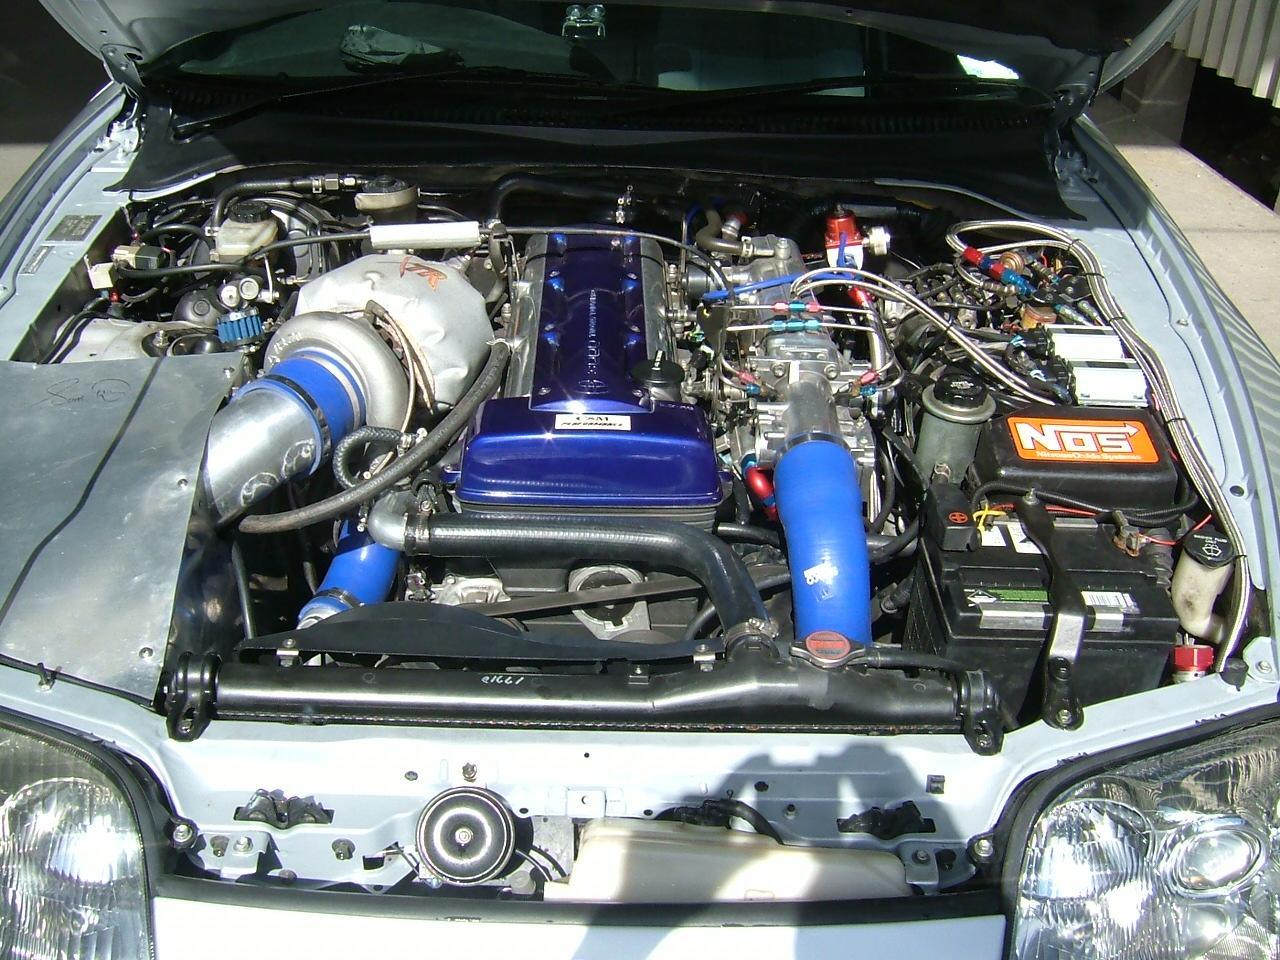 Justin Engine on Toyota Supra Fuel Filter